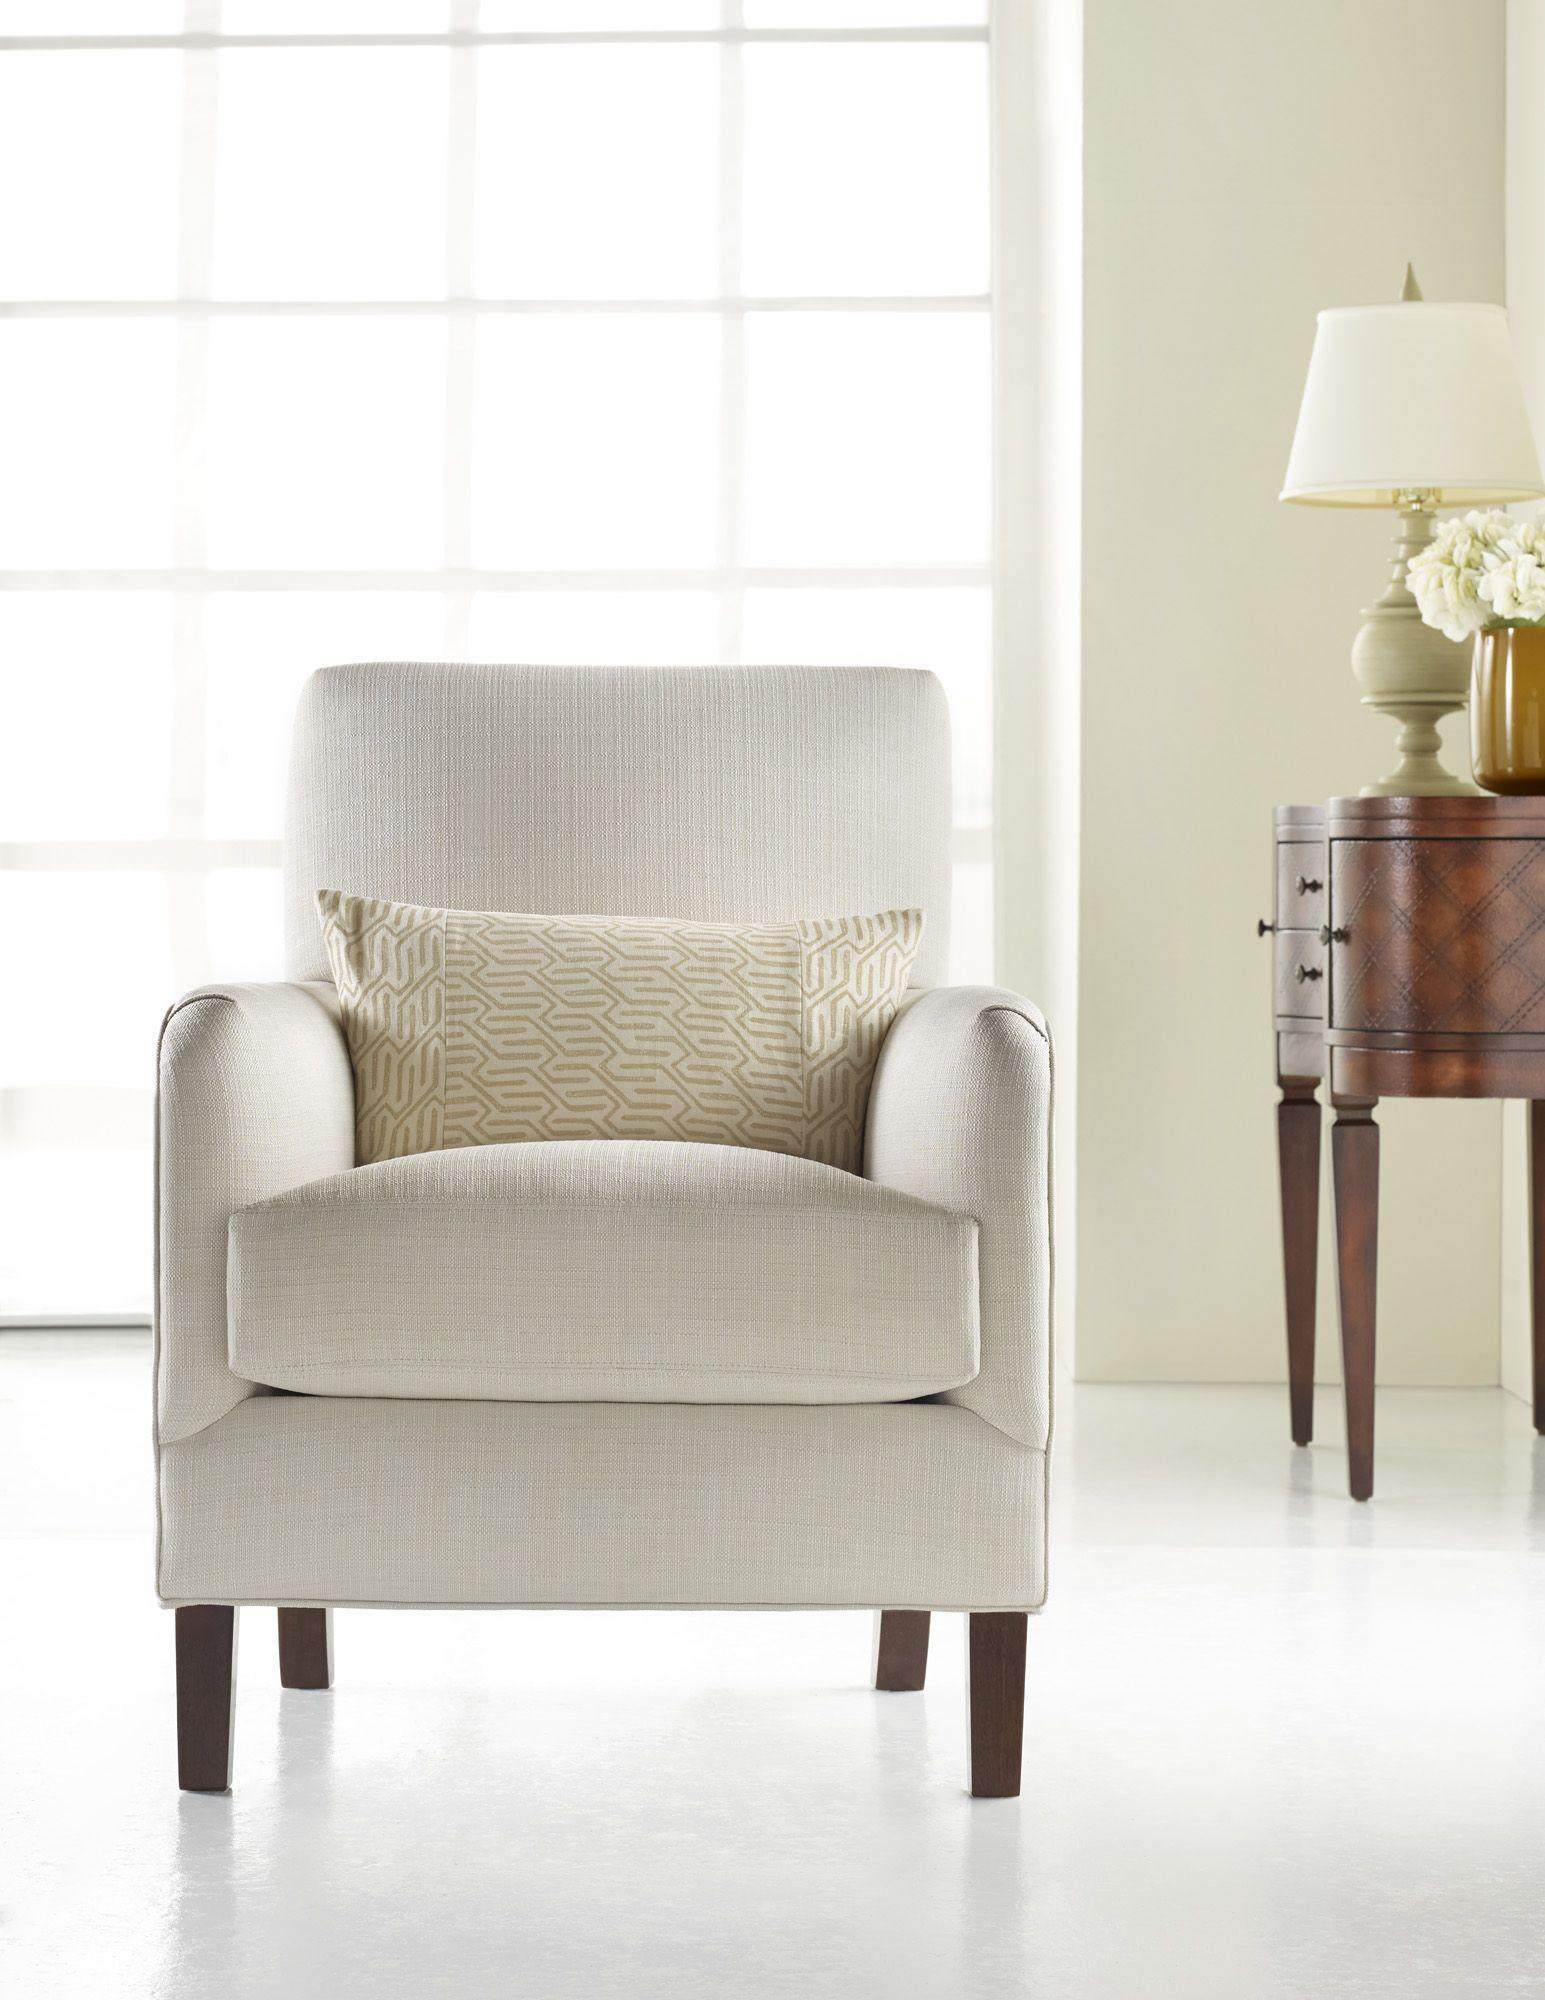 H Contract Furniture | HC9520 Jaxon Lounge Chair